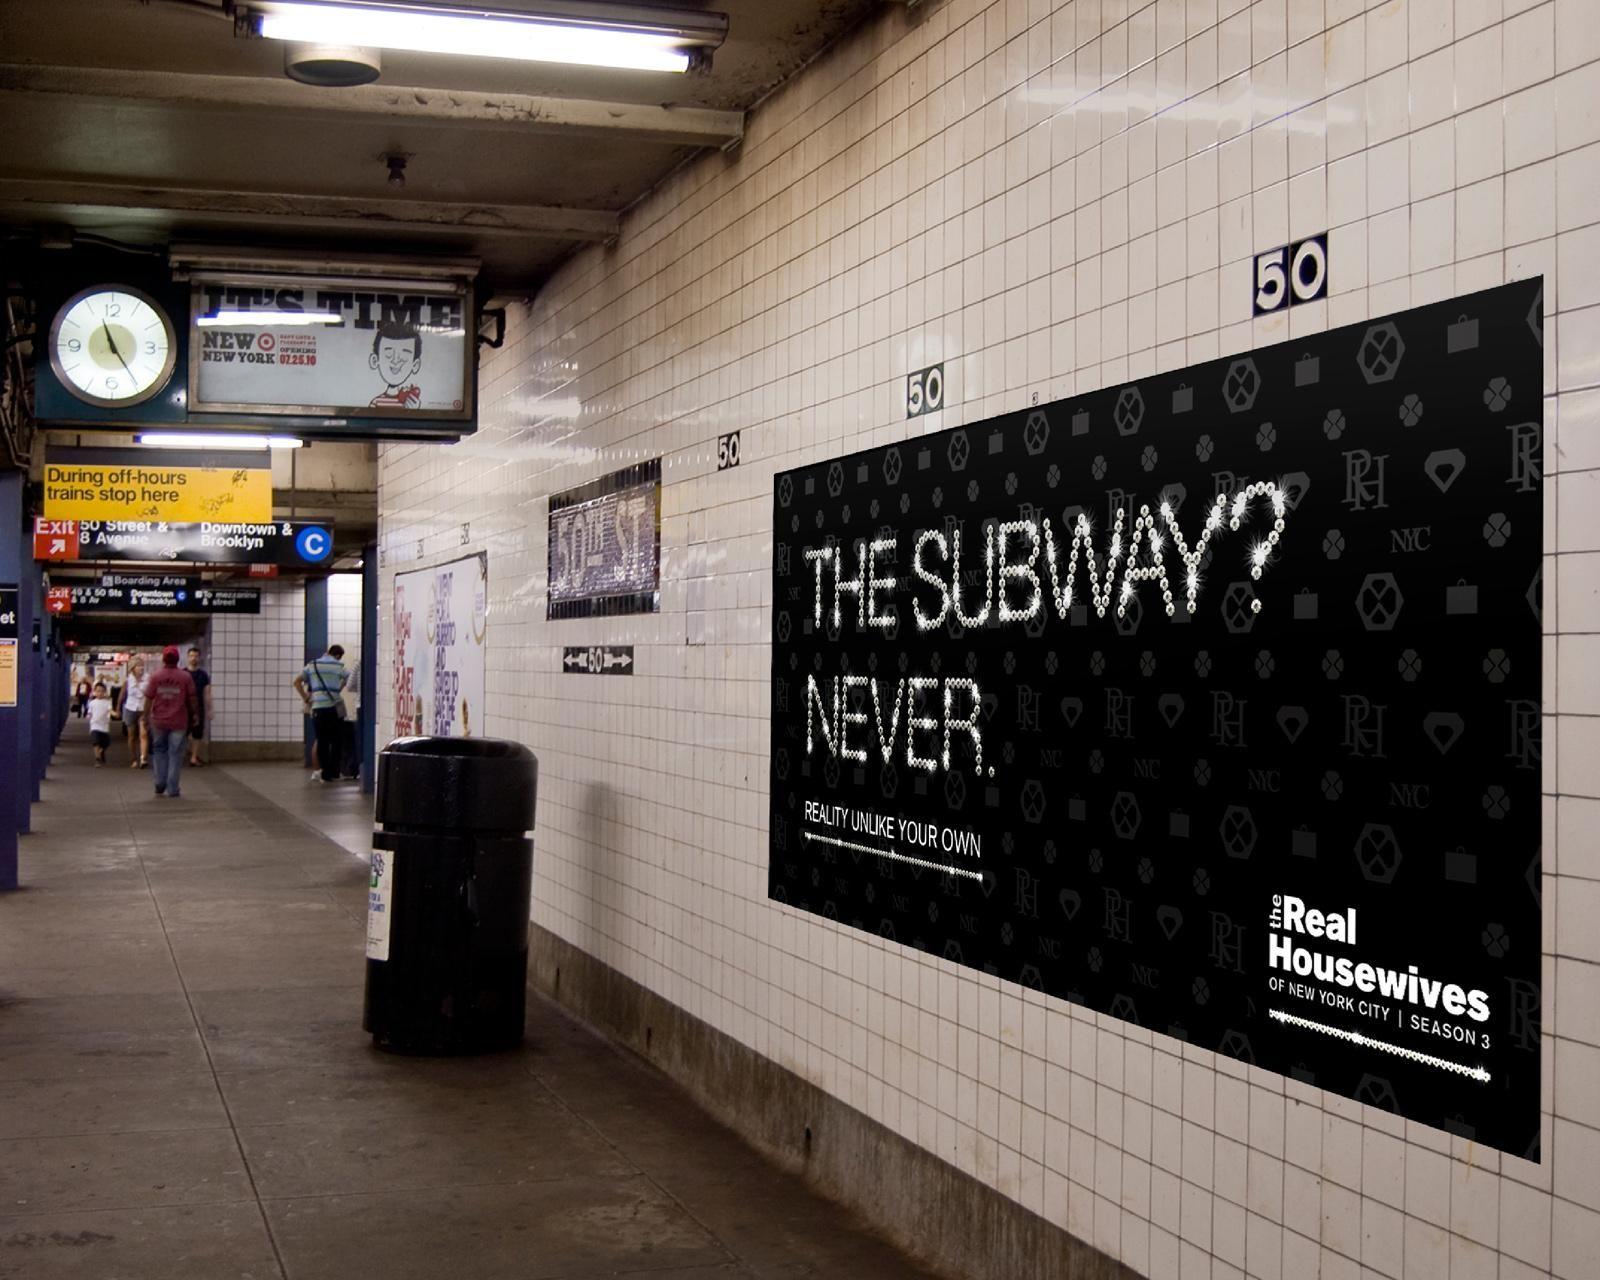 12 best Bus shelter ads images on Pinterest